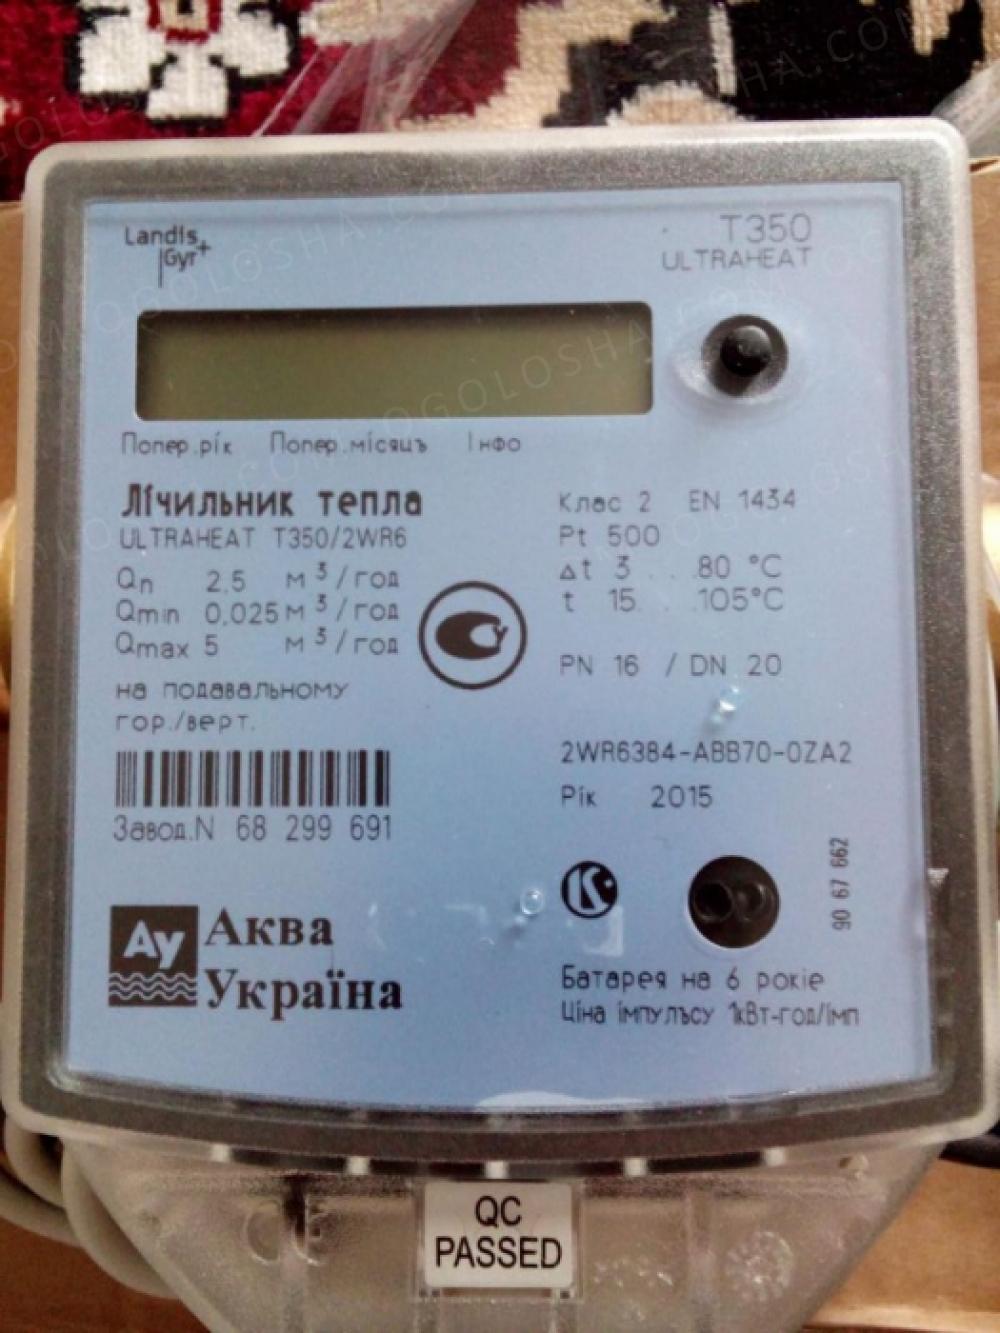 Счетчик тепла Ultraheat T350/2WR6